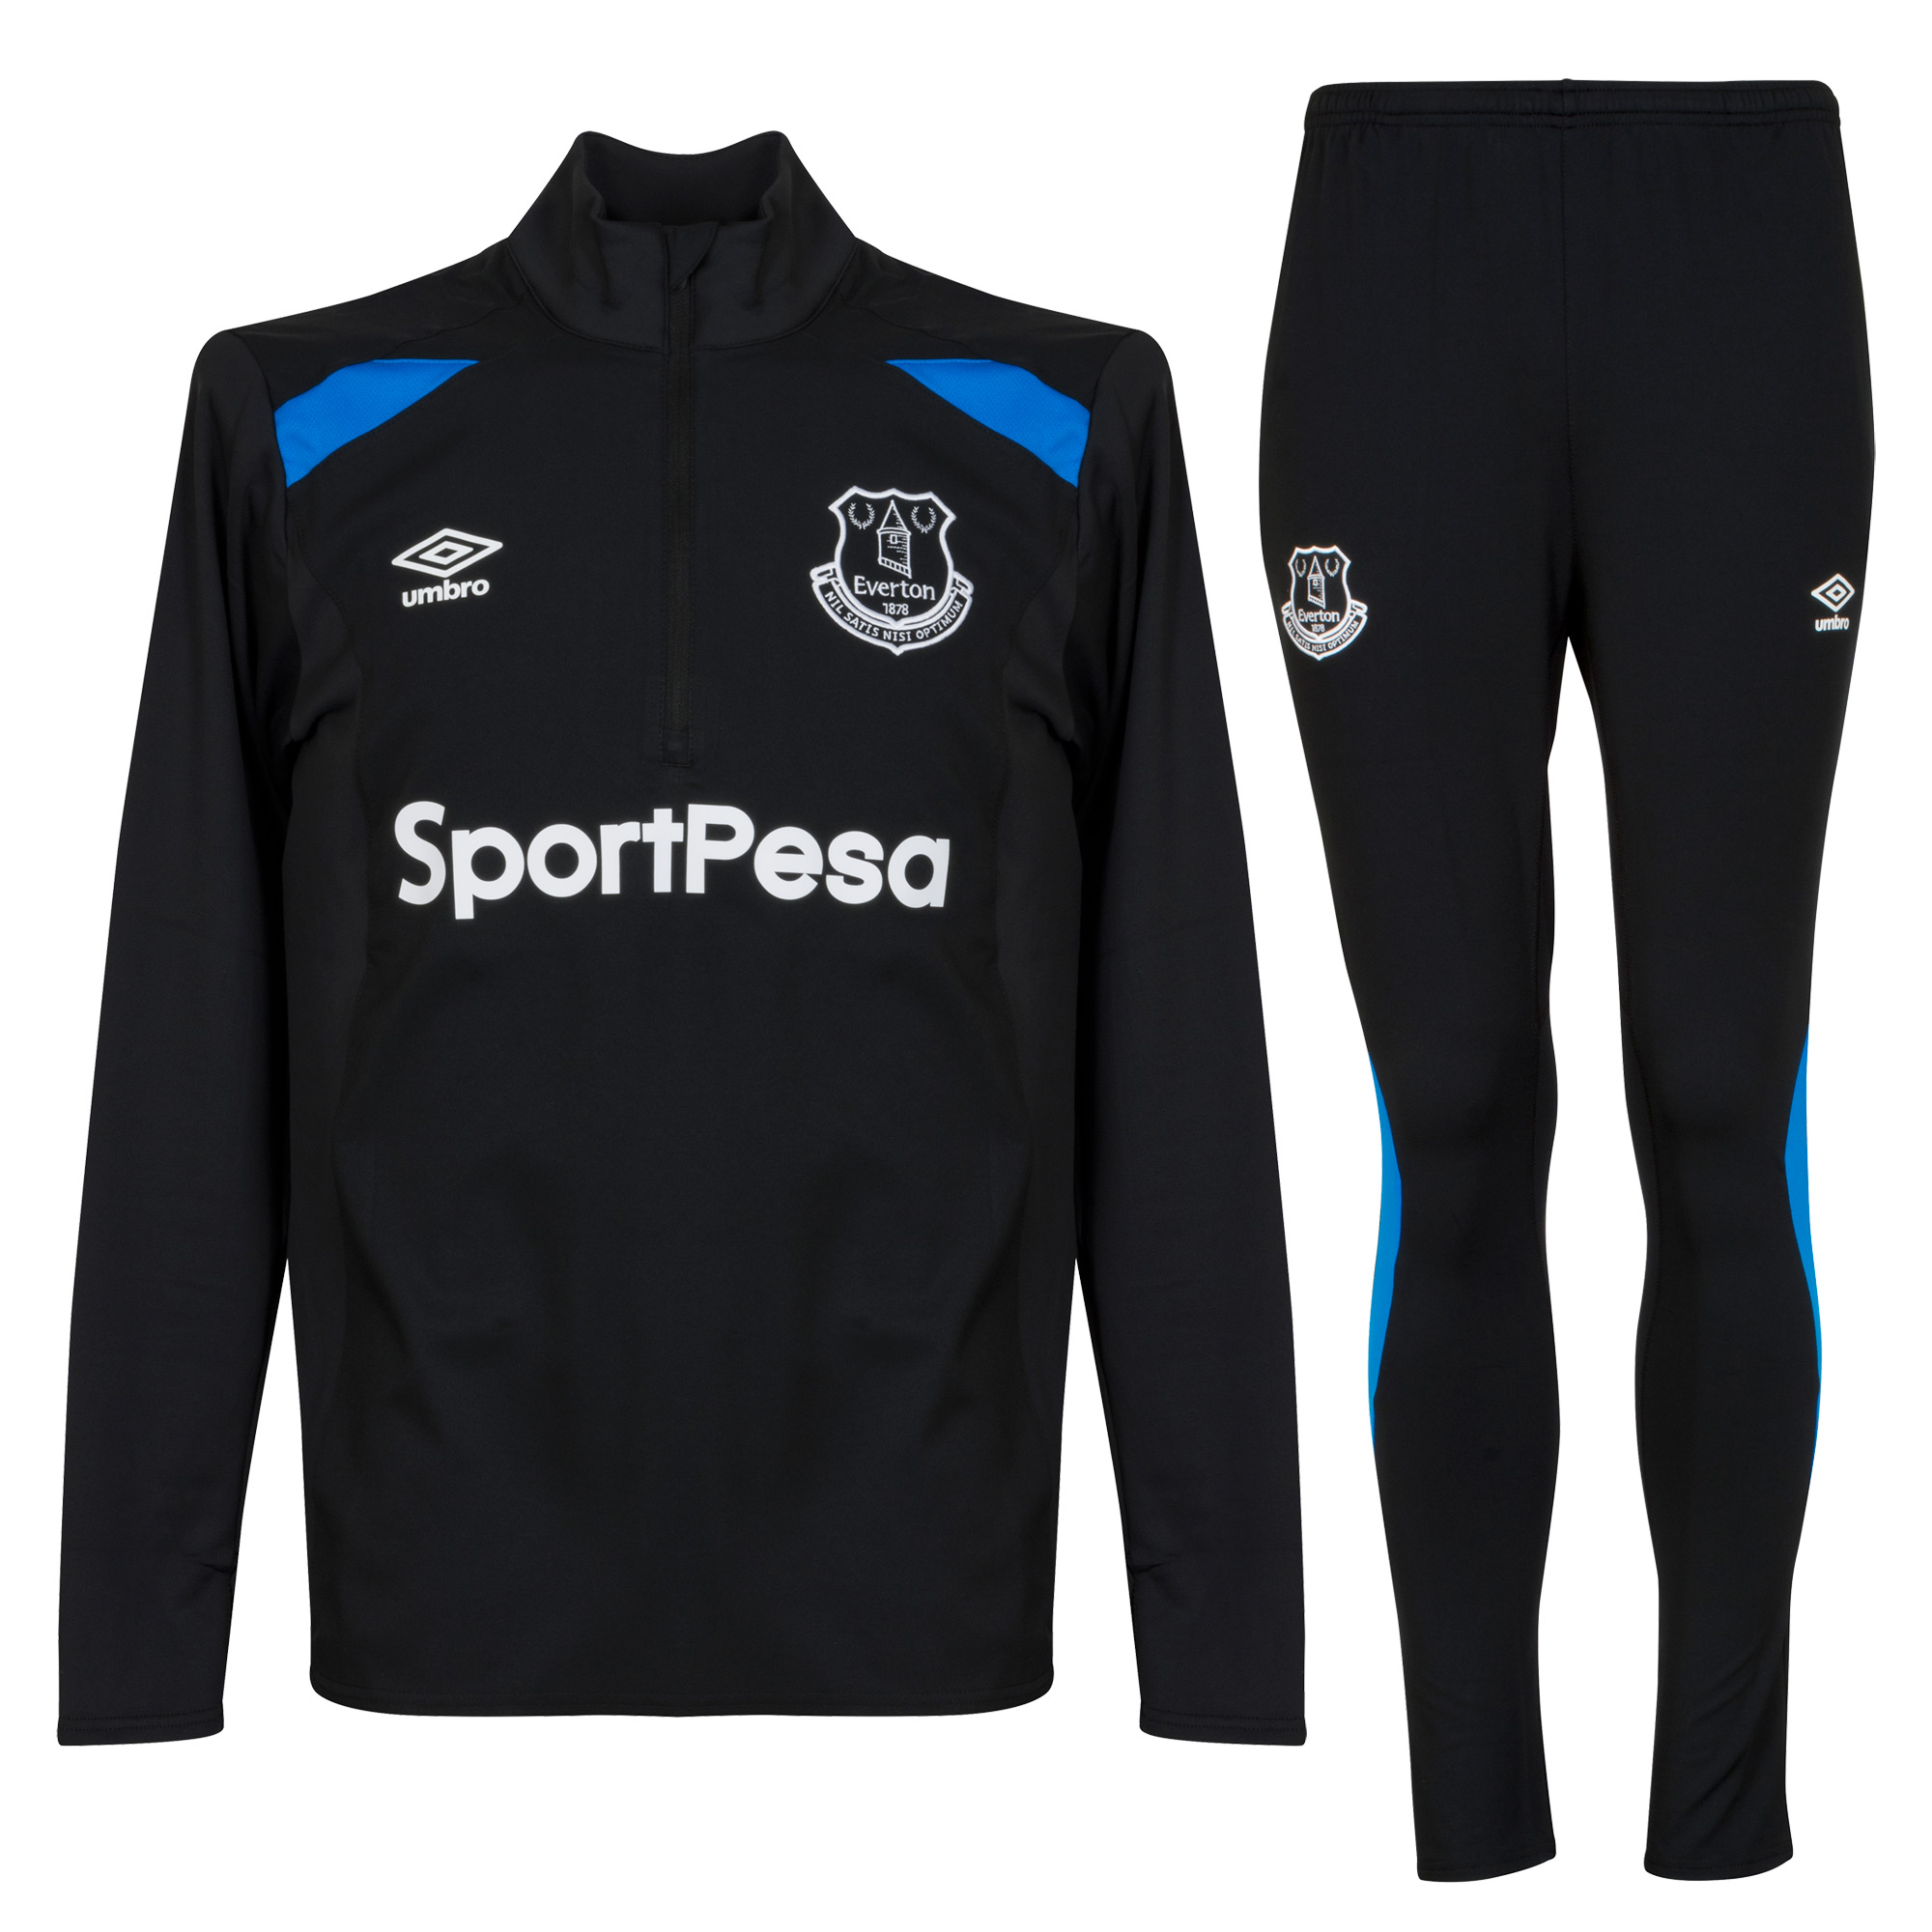 Everton Training Suit 2017 / 2018 - Black/Royal - L